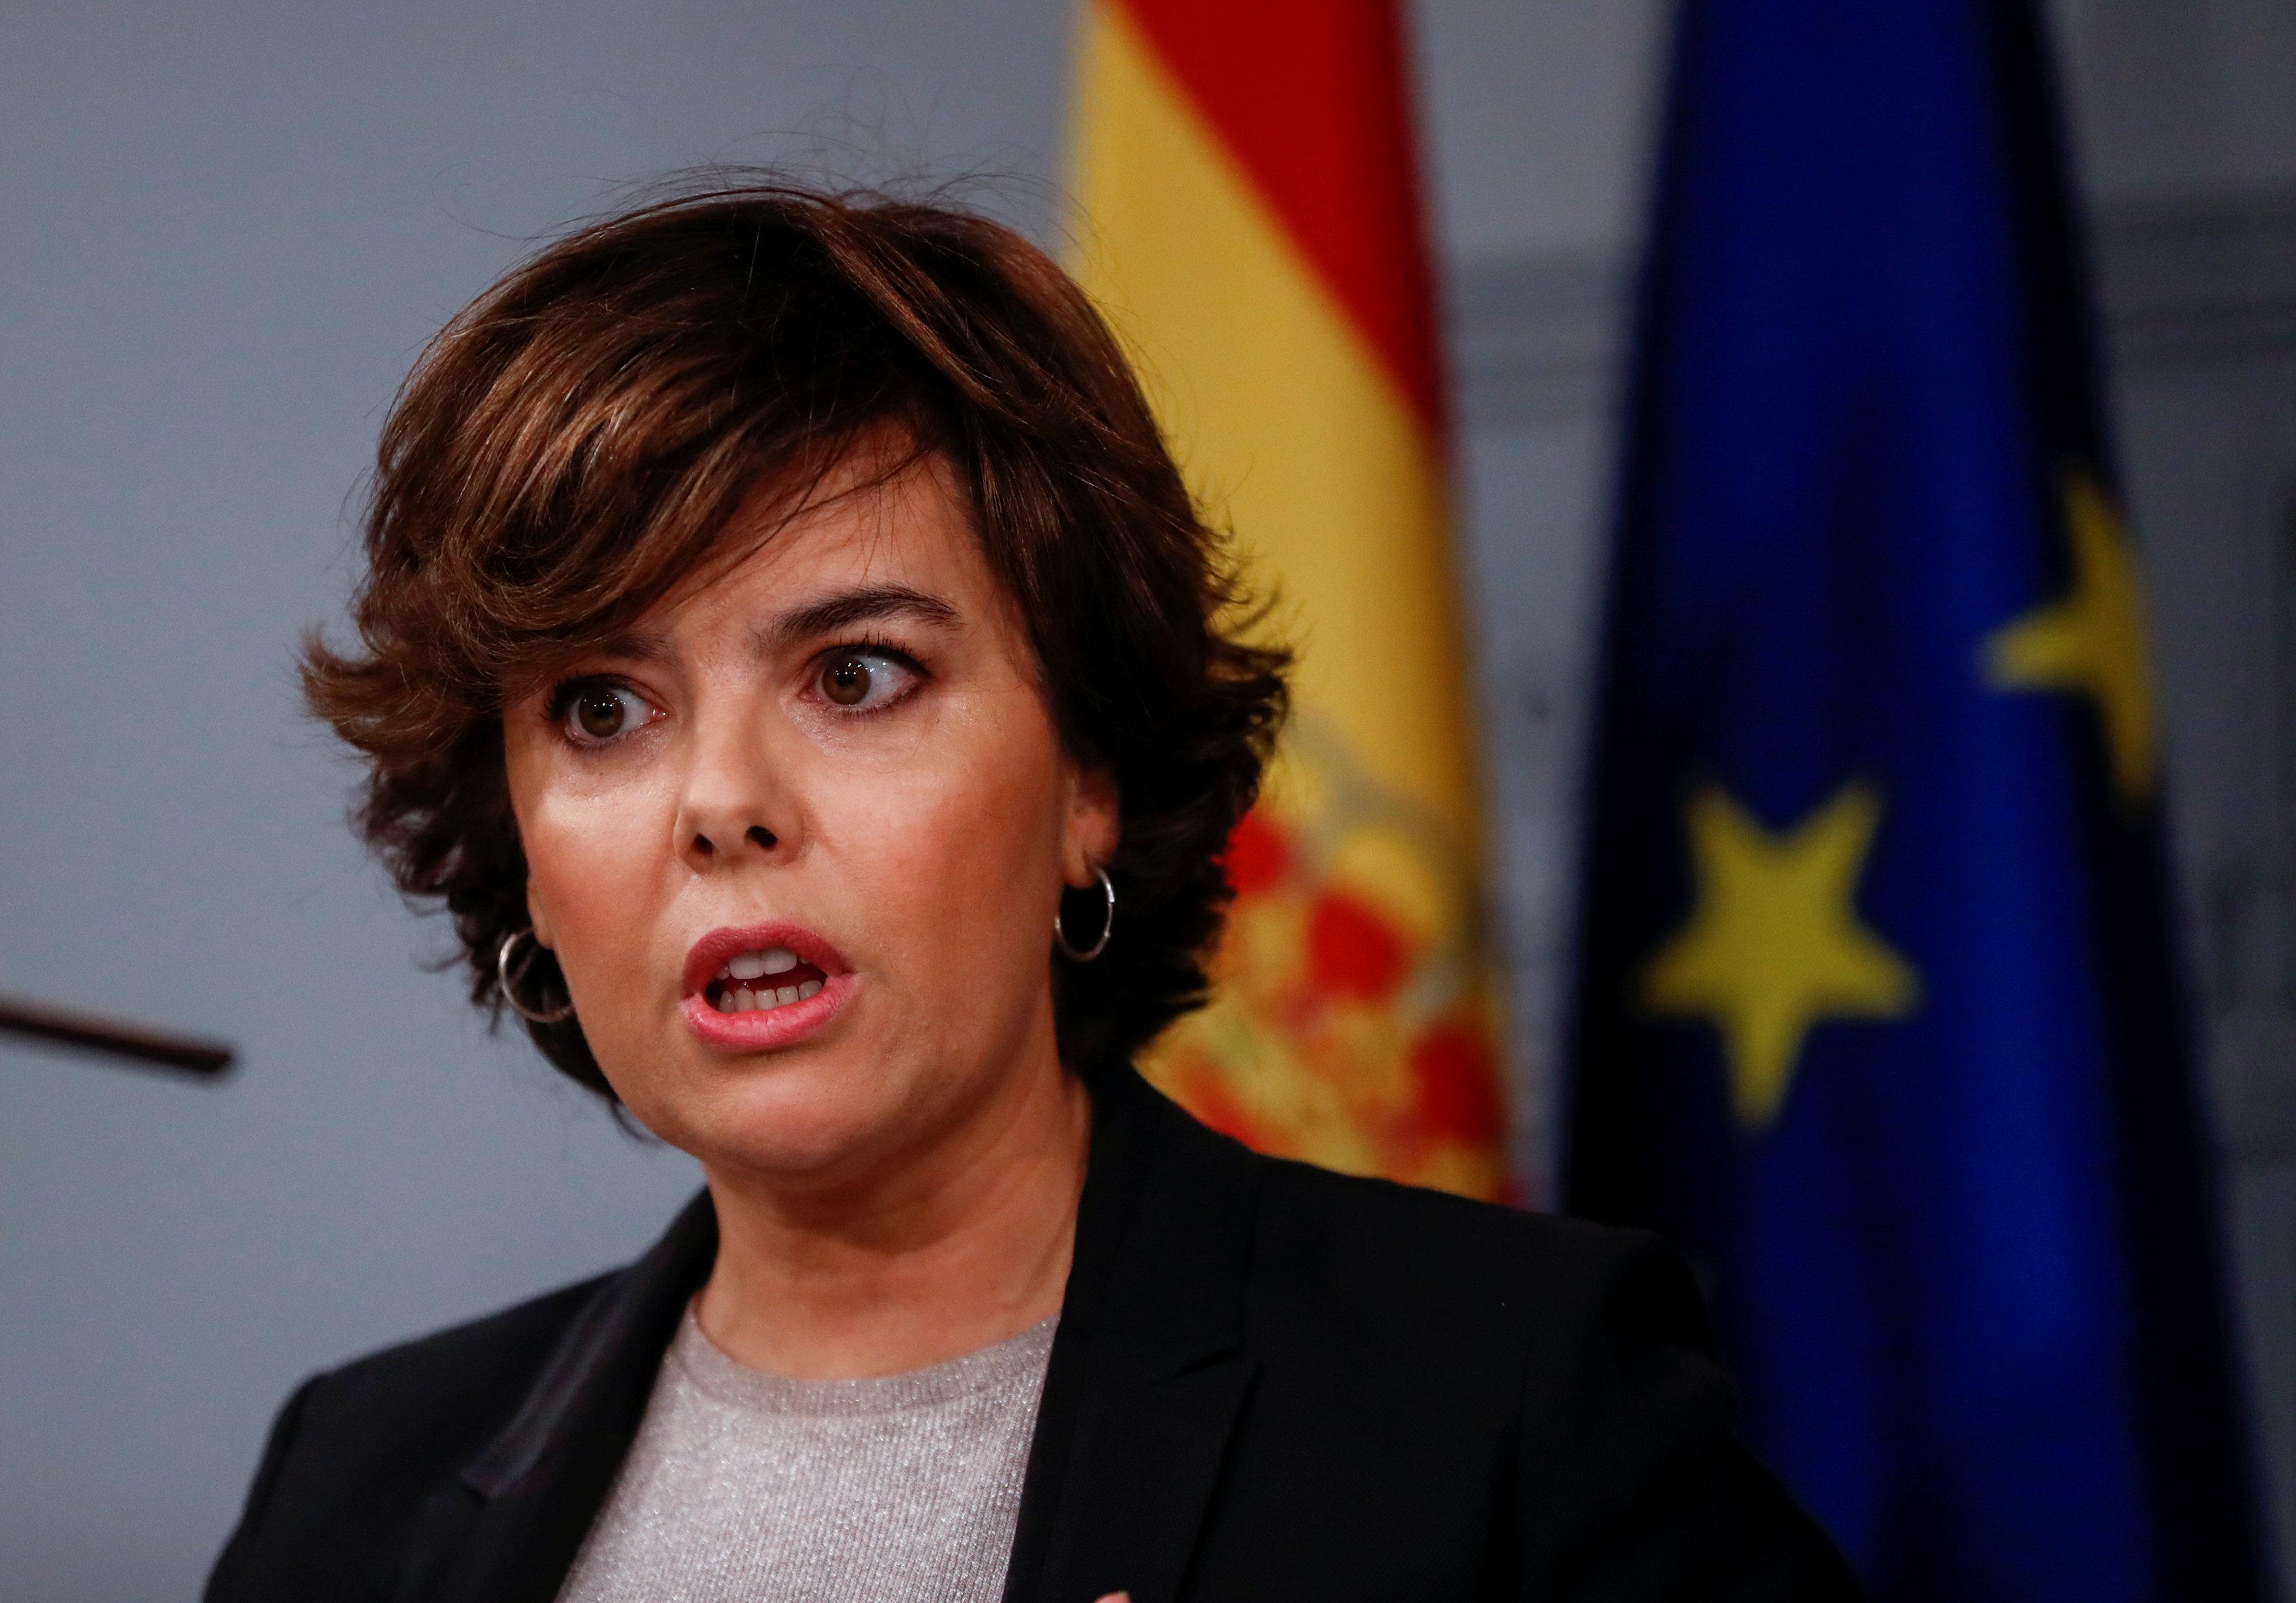 2017 10 16T092743Z 1928125048 RC16C7758700 RTRMADP 3 SPAIN POLITICS CATALONIA